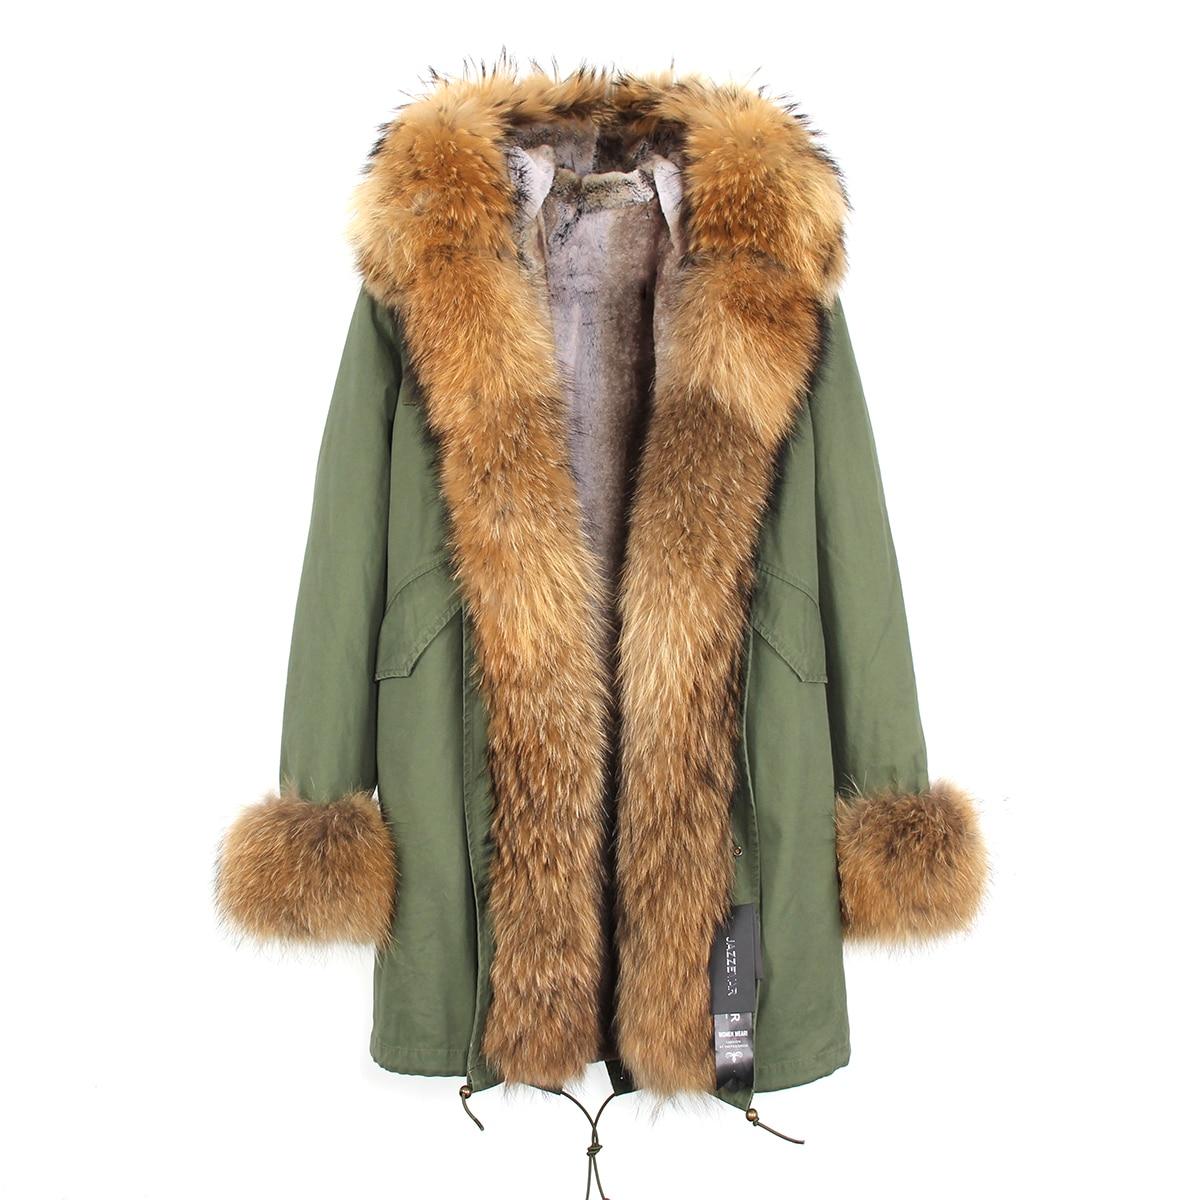 JAZZEVAR 2019 New High Fashion Women's Luxurious Large Fox Fur Collar Raccoon Cuff Parkas Hooded Coat Outwear Warm Winter Jacket